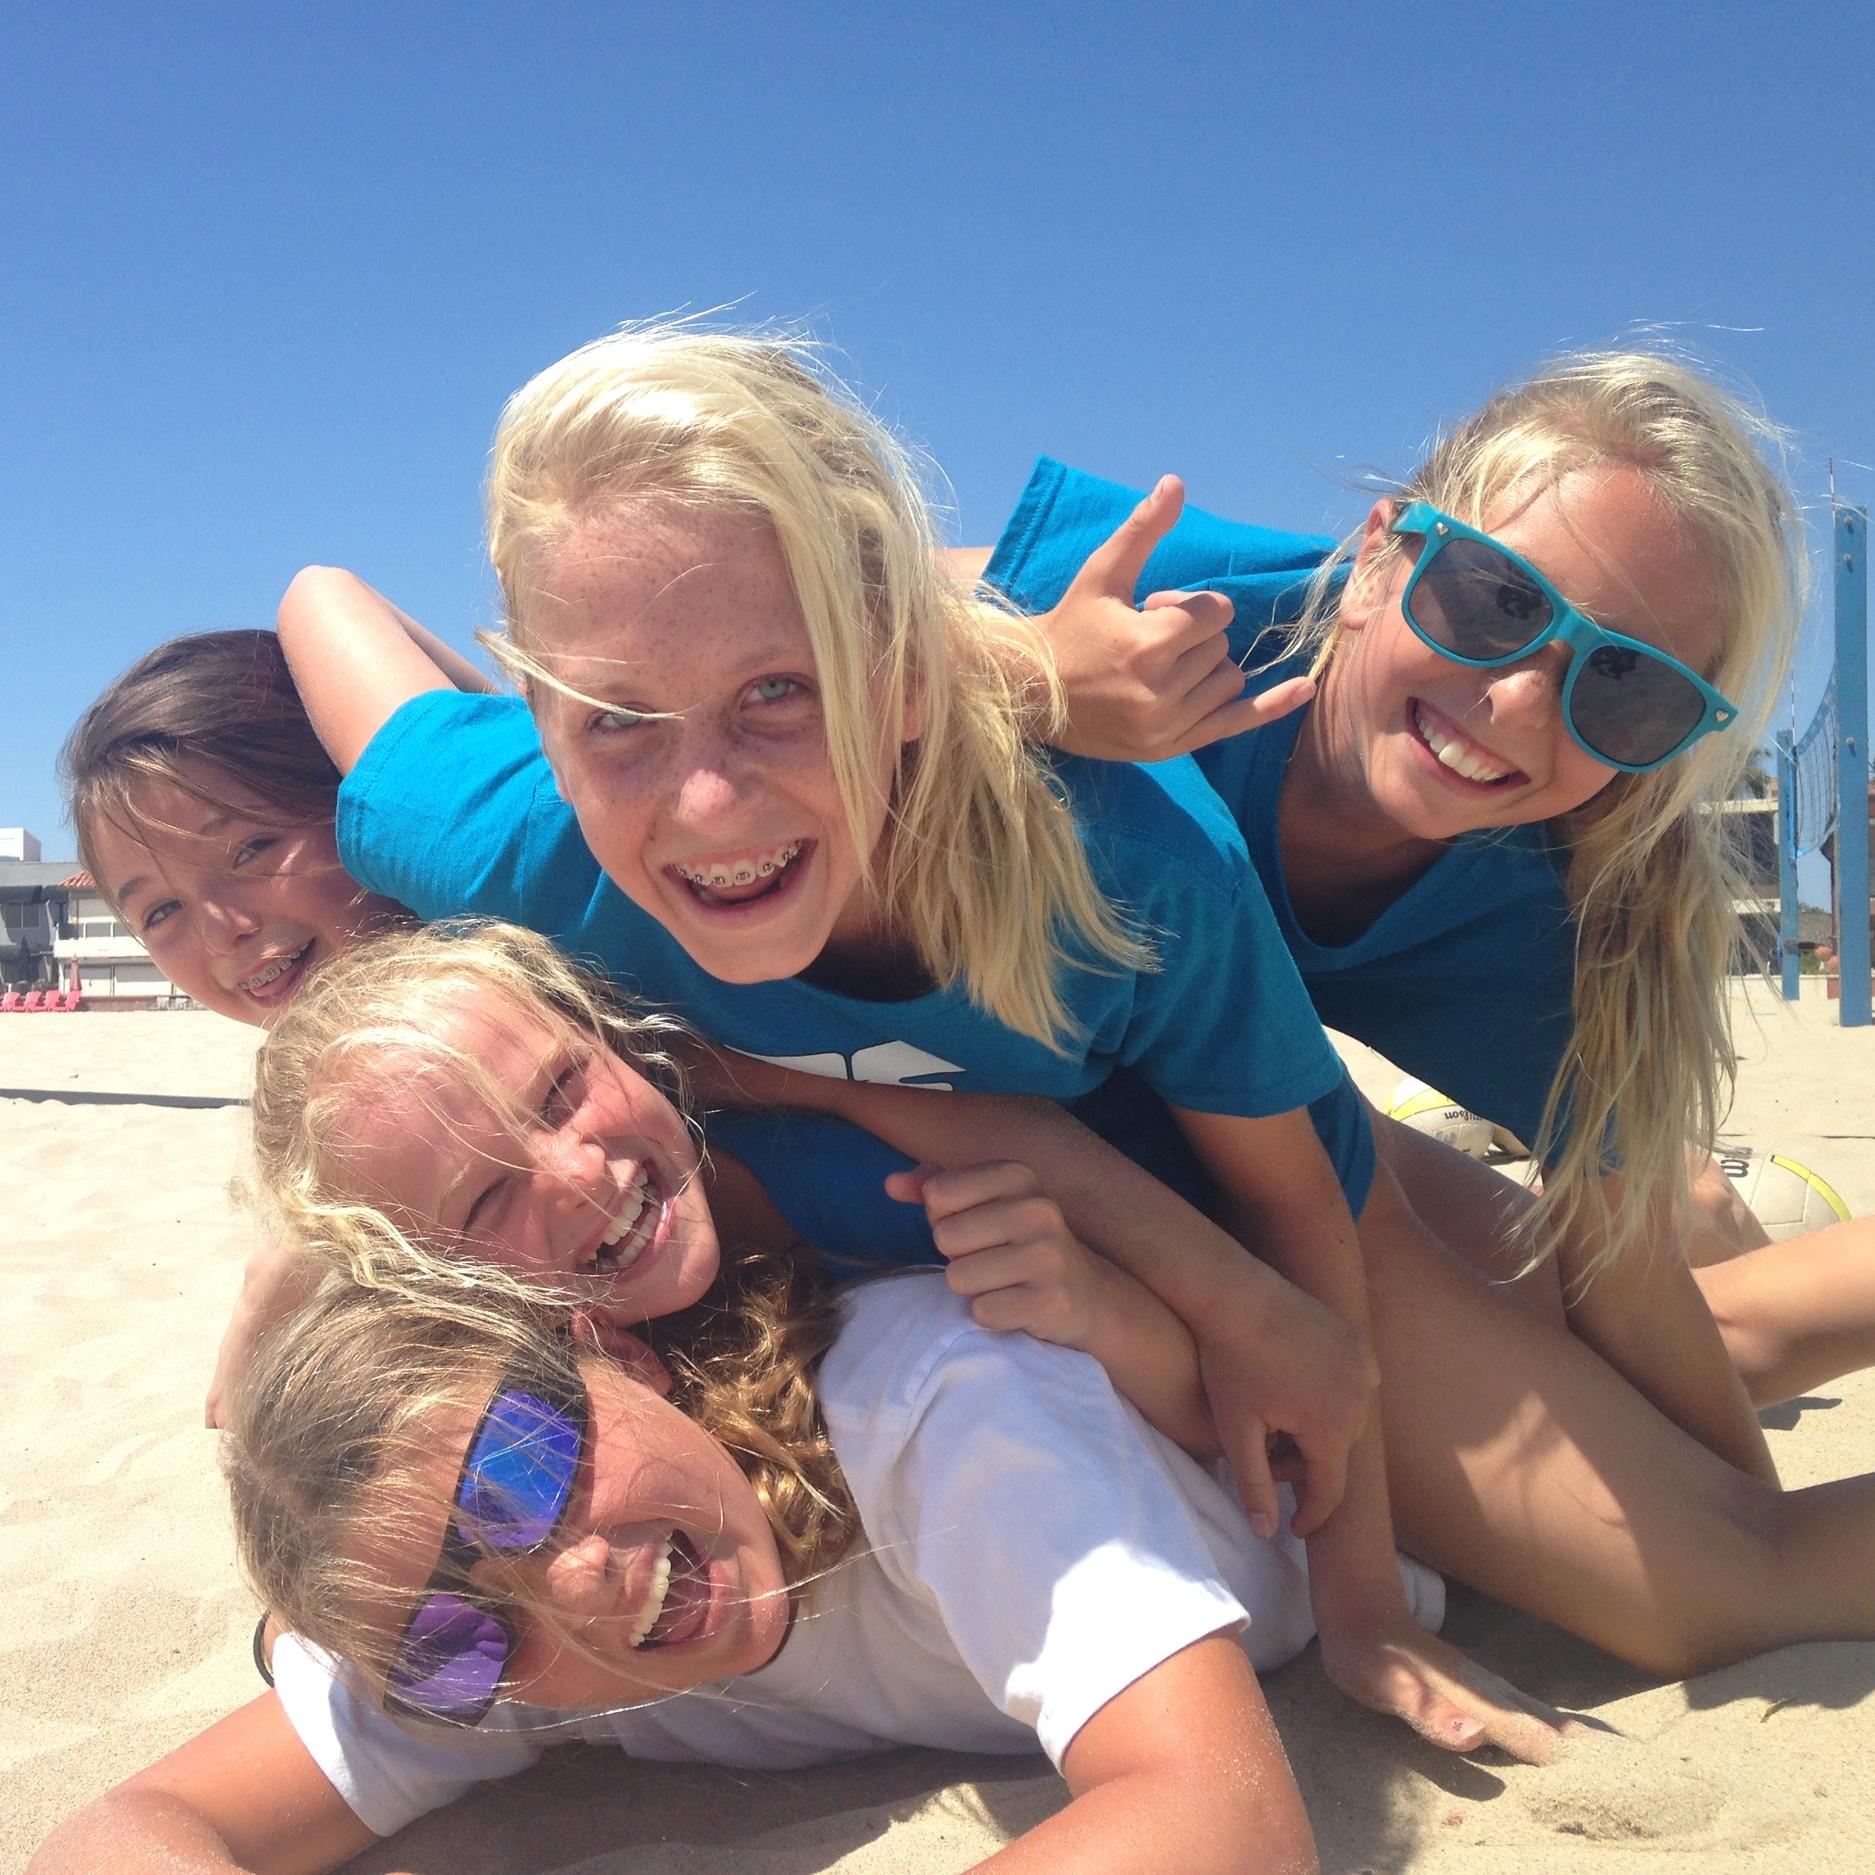 MEET THE TEAM - The Rockstars of Beach Elite!